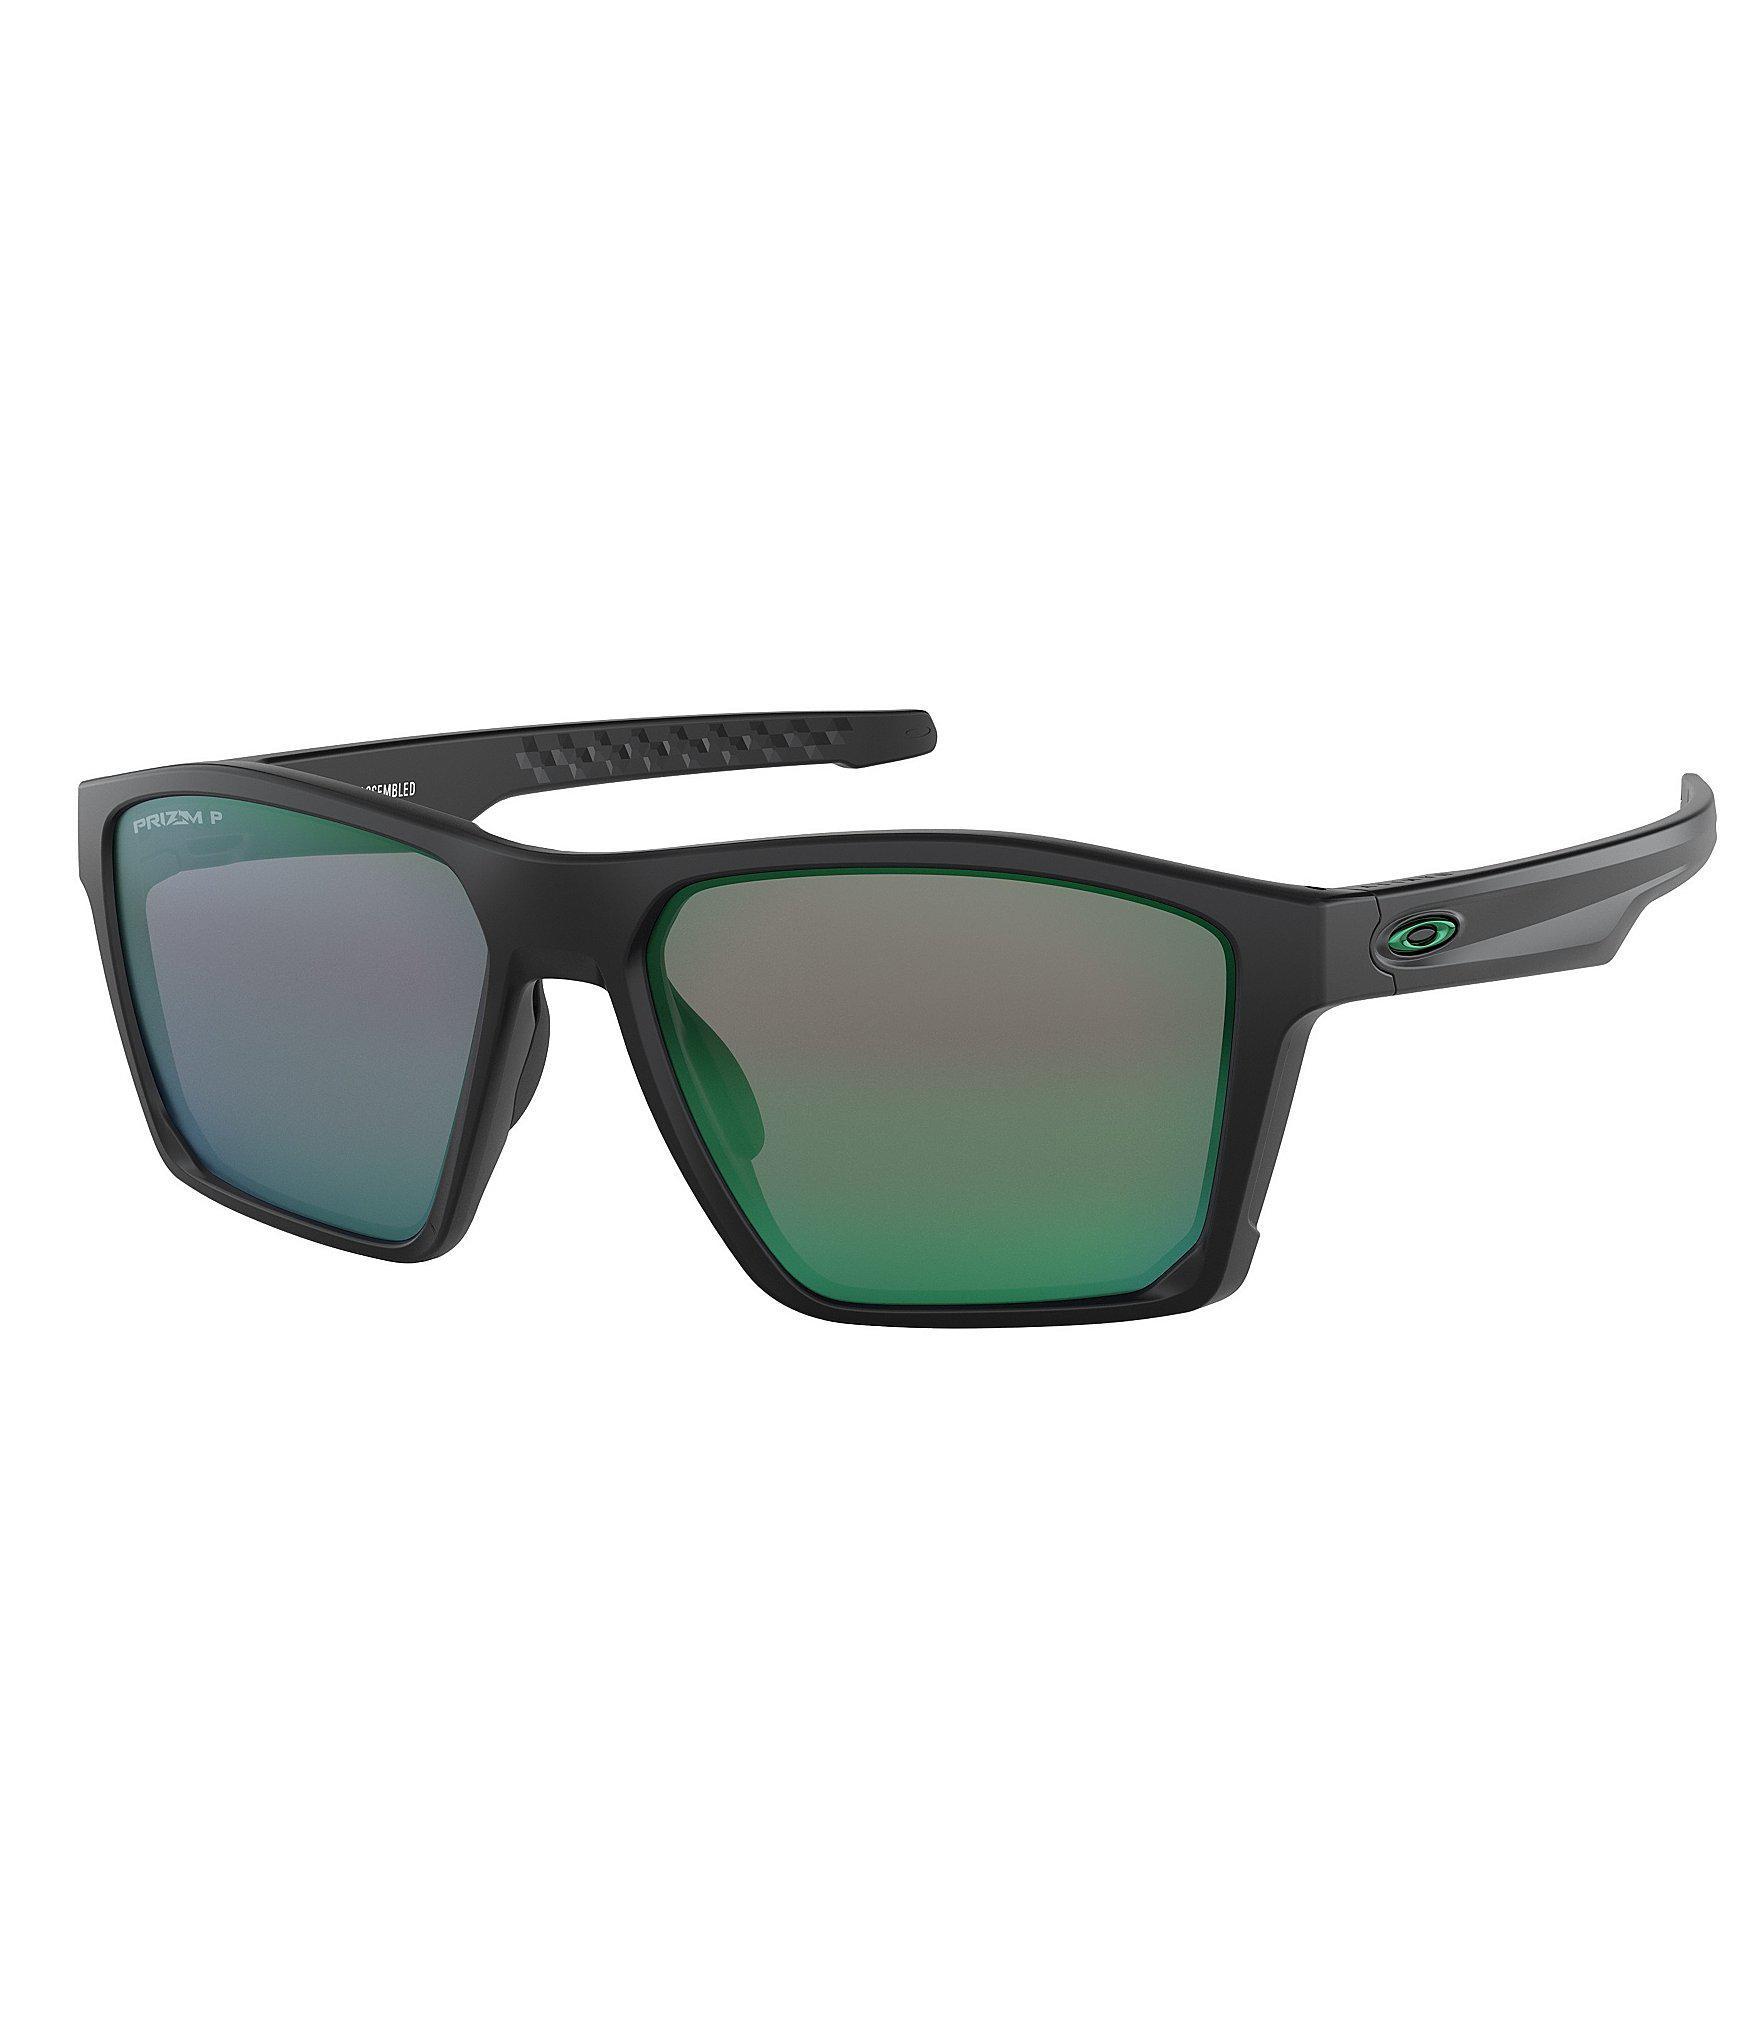 b9c9d3e40d ... aliexpress lyst oakley mens target line green lens sunglasses in black  for men b6ff1 a1f3c